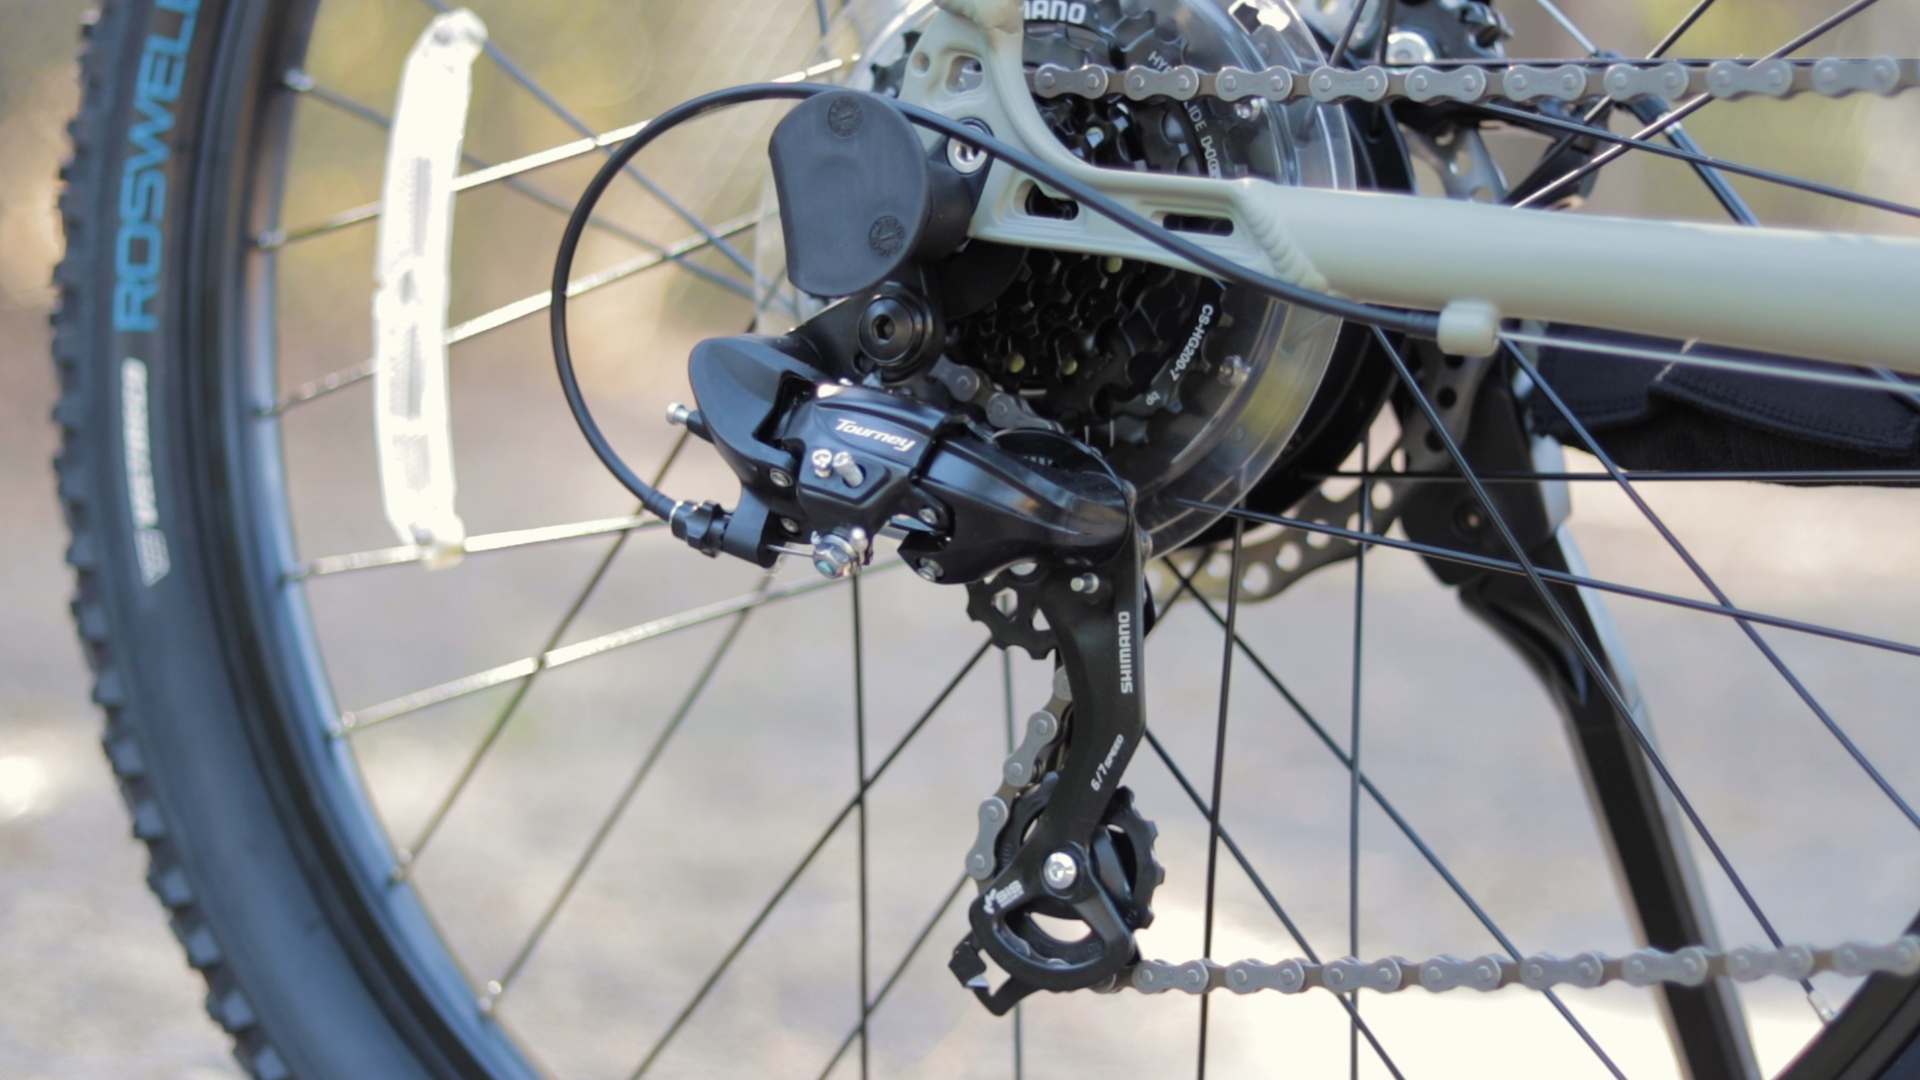 electrified-reviews-izip-trlz-electric-bike-review-shimano-tourney-derailleur.jpg